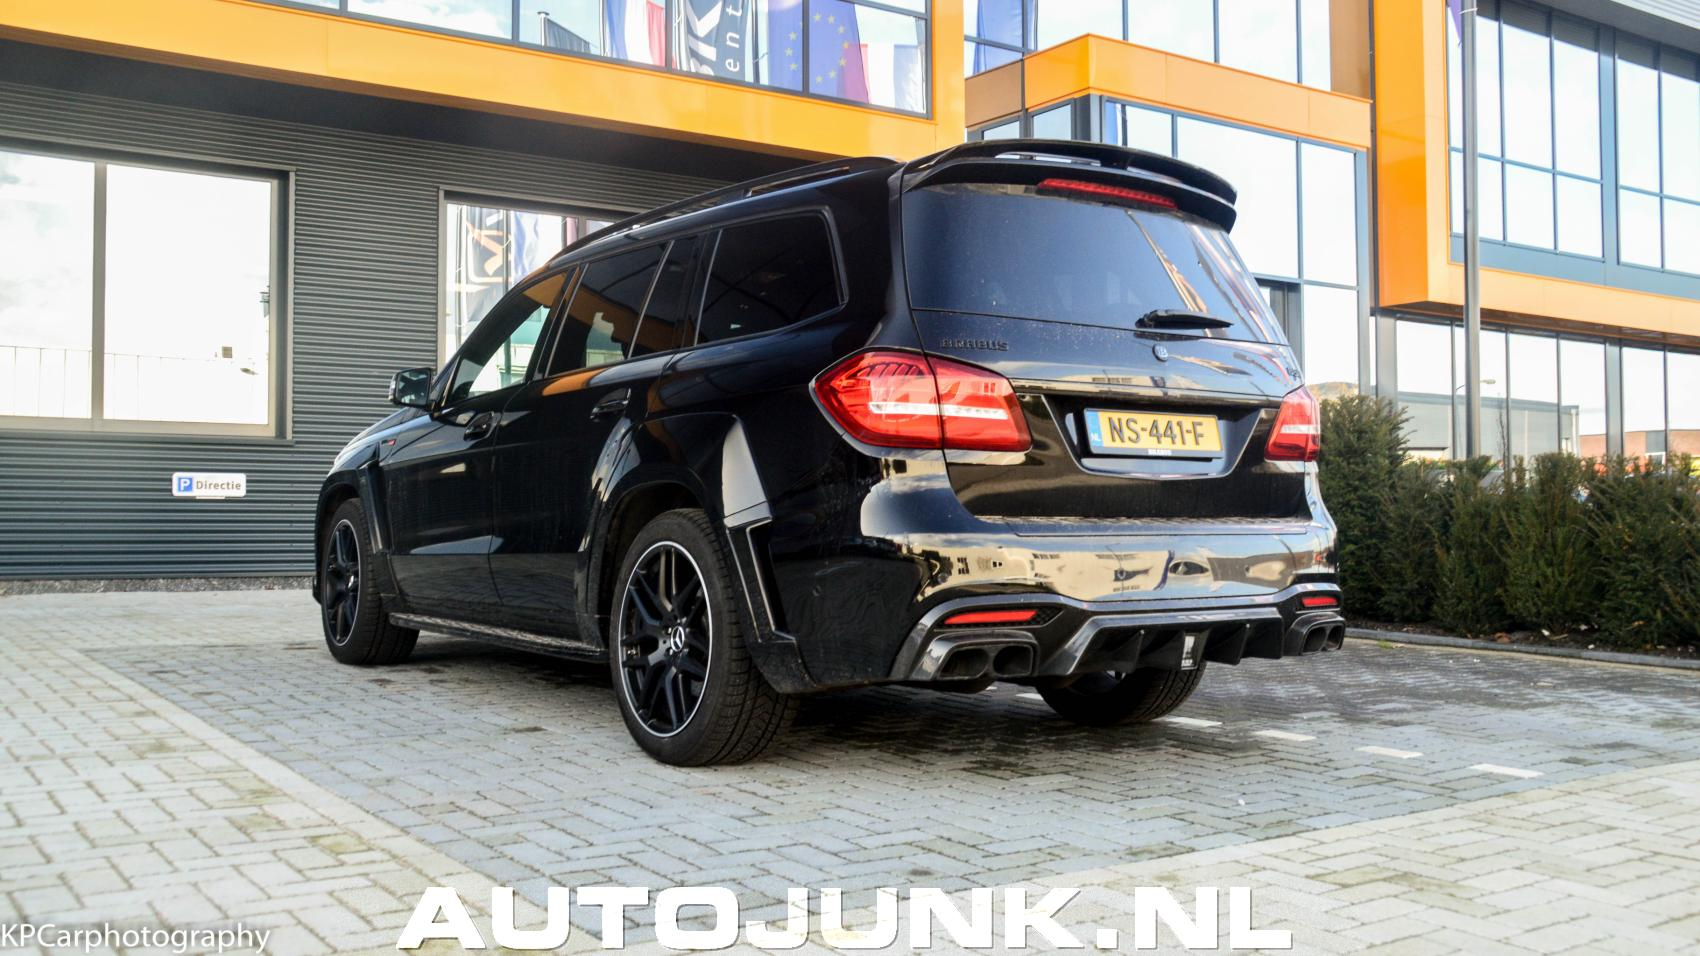 Mercedes Amg Brabus Gls 850 6 0 Biturbo Foto S Autojunk Nl 213064